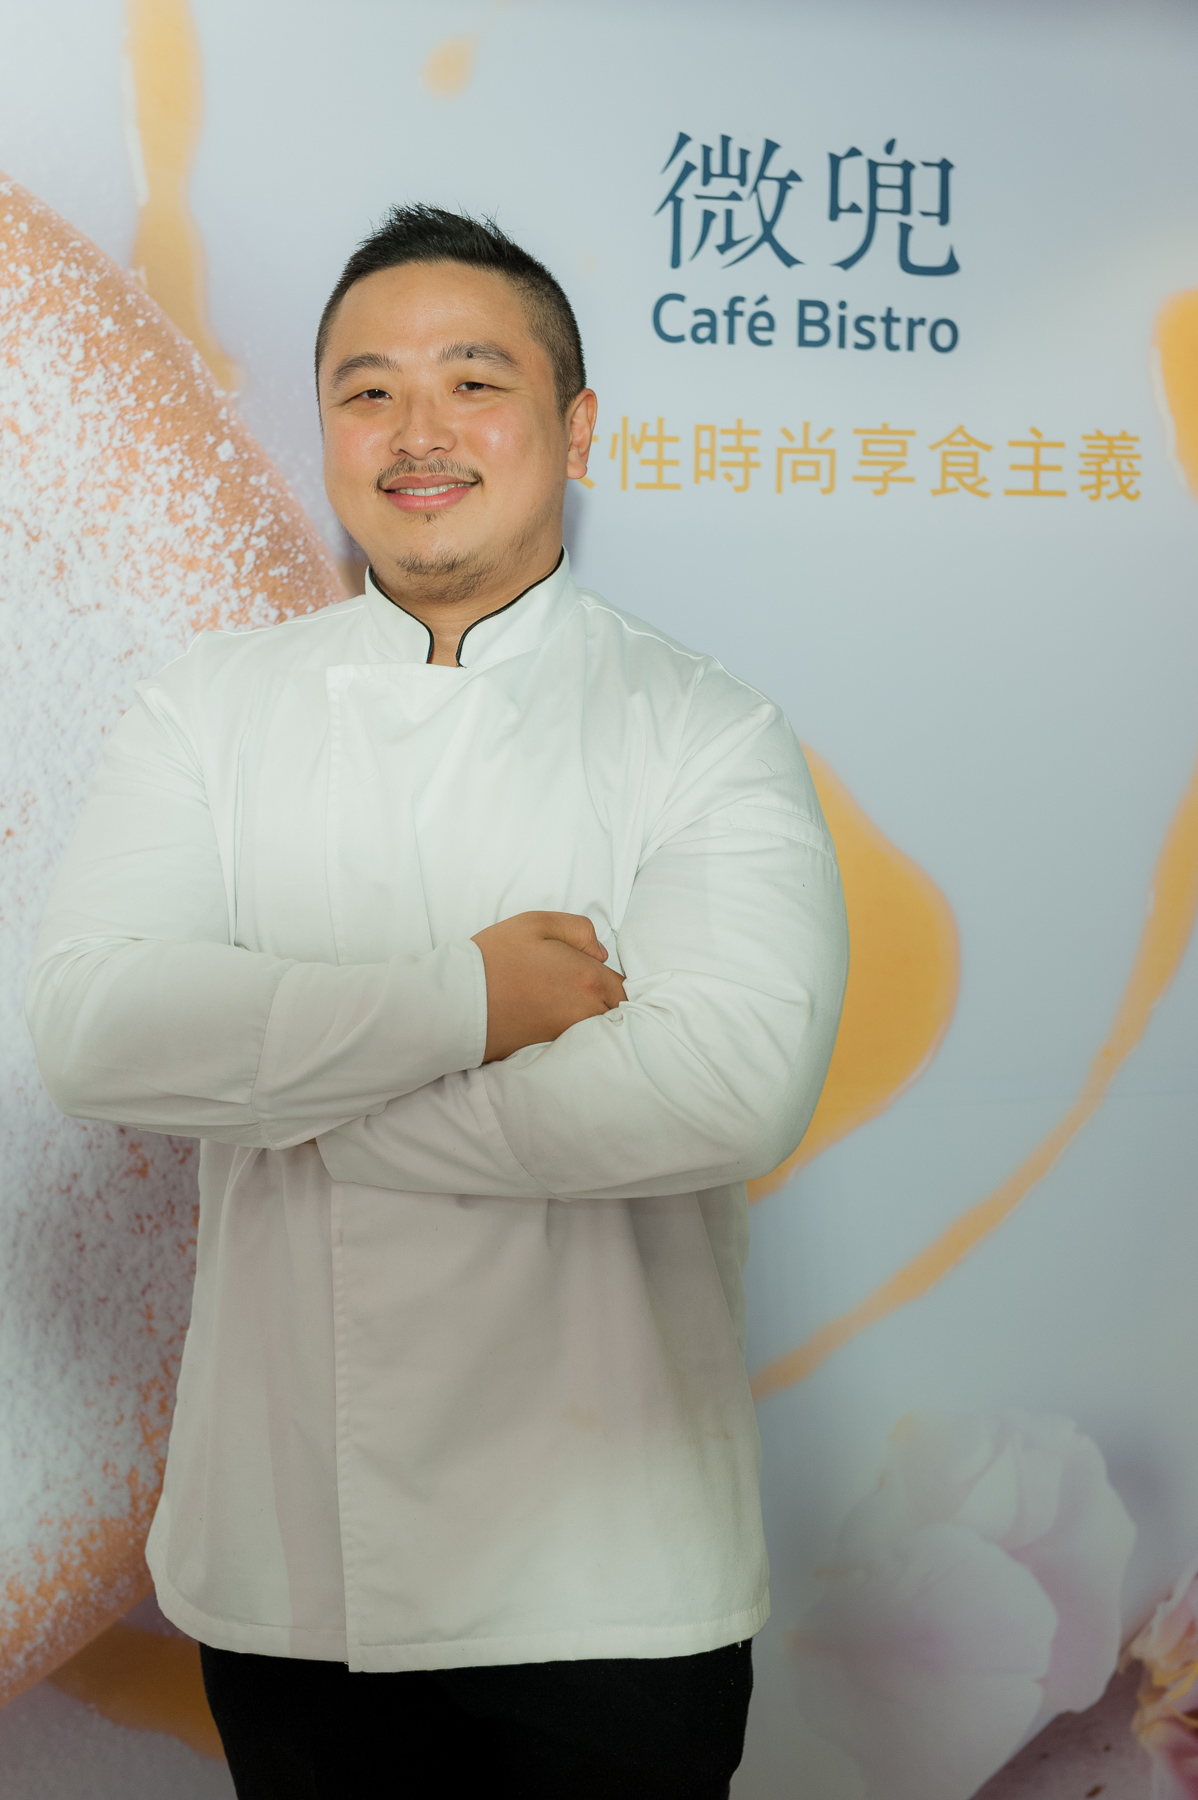 petit doux『微兜Caf Bistro』主廚高至平融合台日法風格,展現各式獨創料理